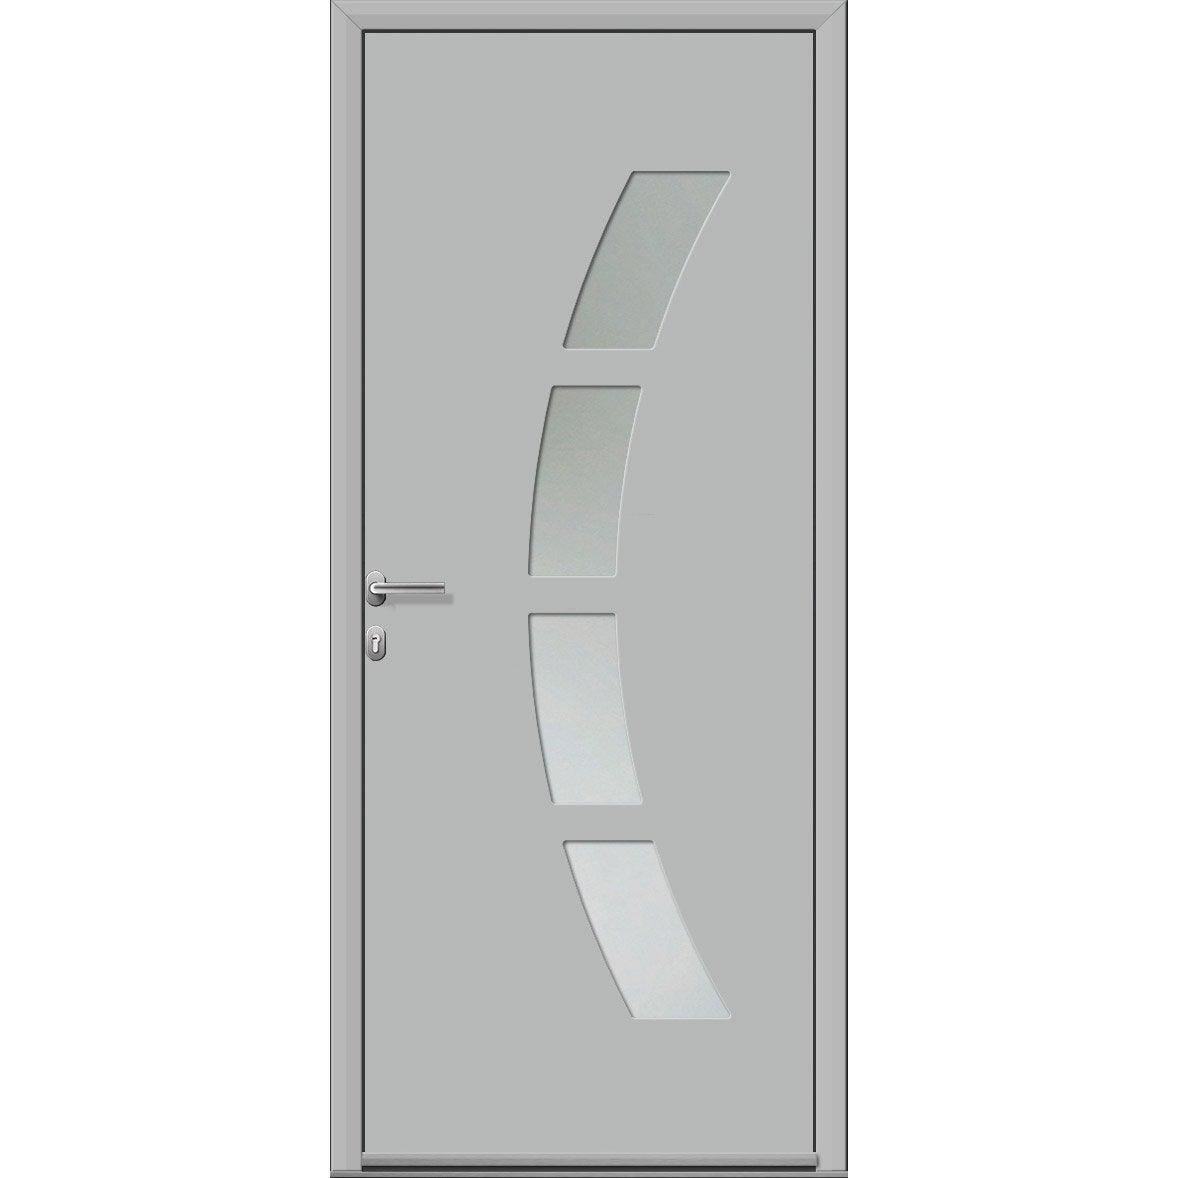 Porte D Entree Alu Toledo 2 Premium H 215 X L 90 Cm Vitree Gris Clair Pg Leroy Merlin